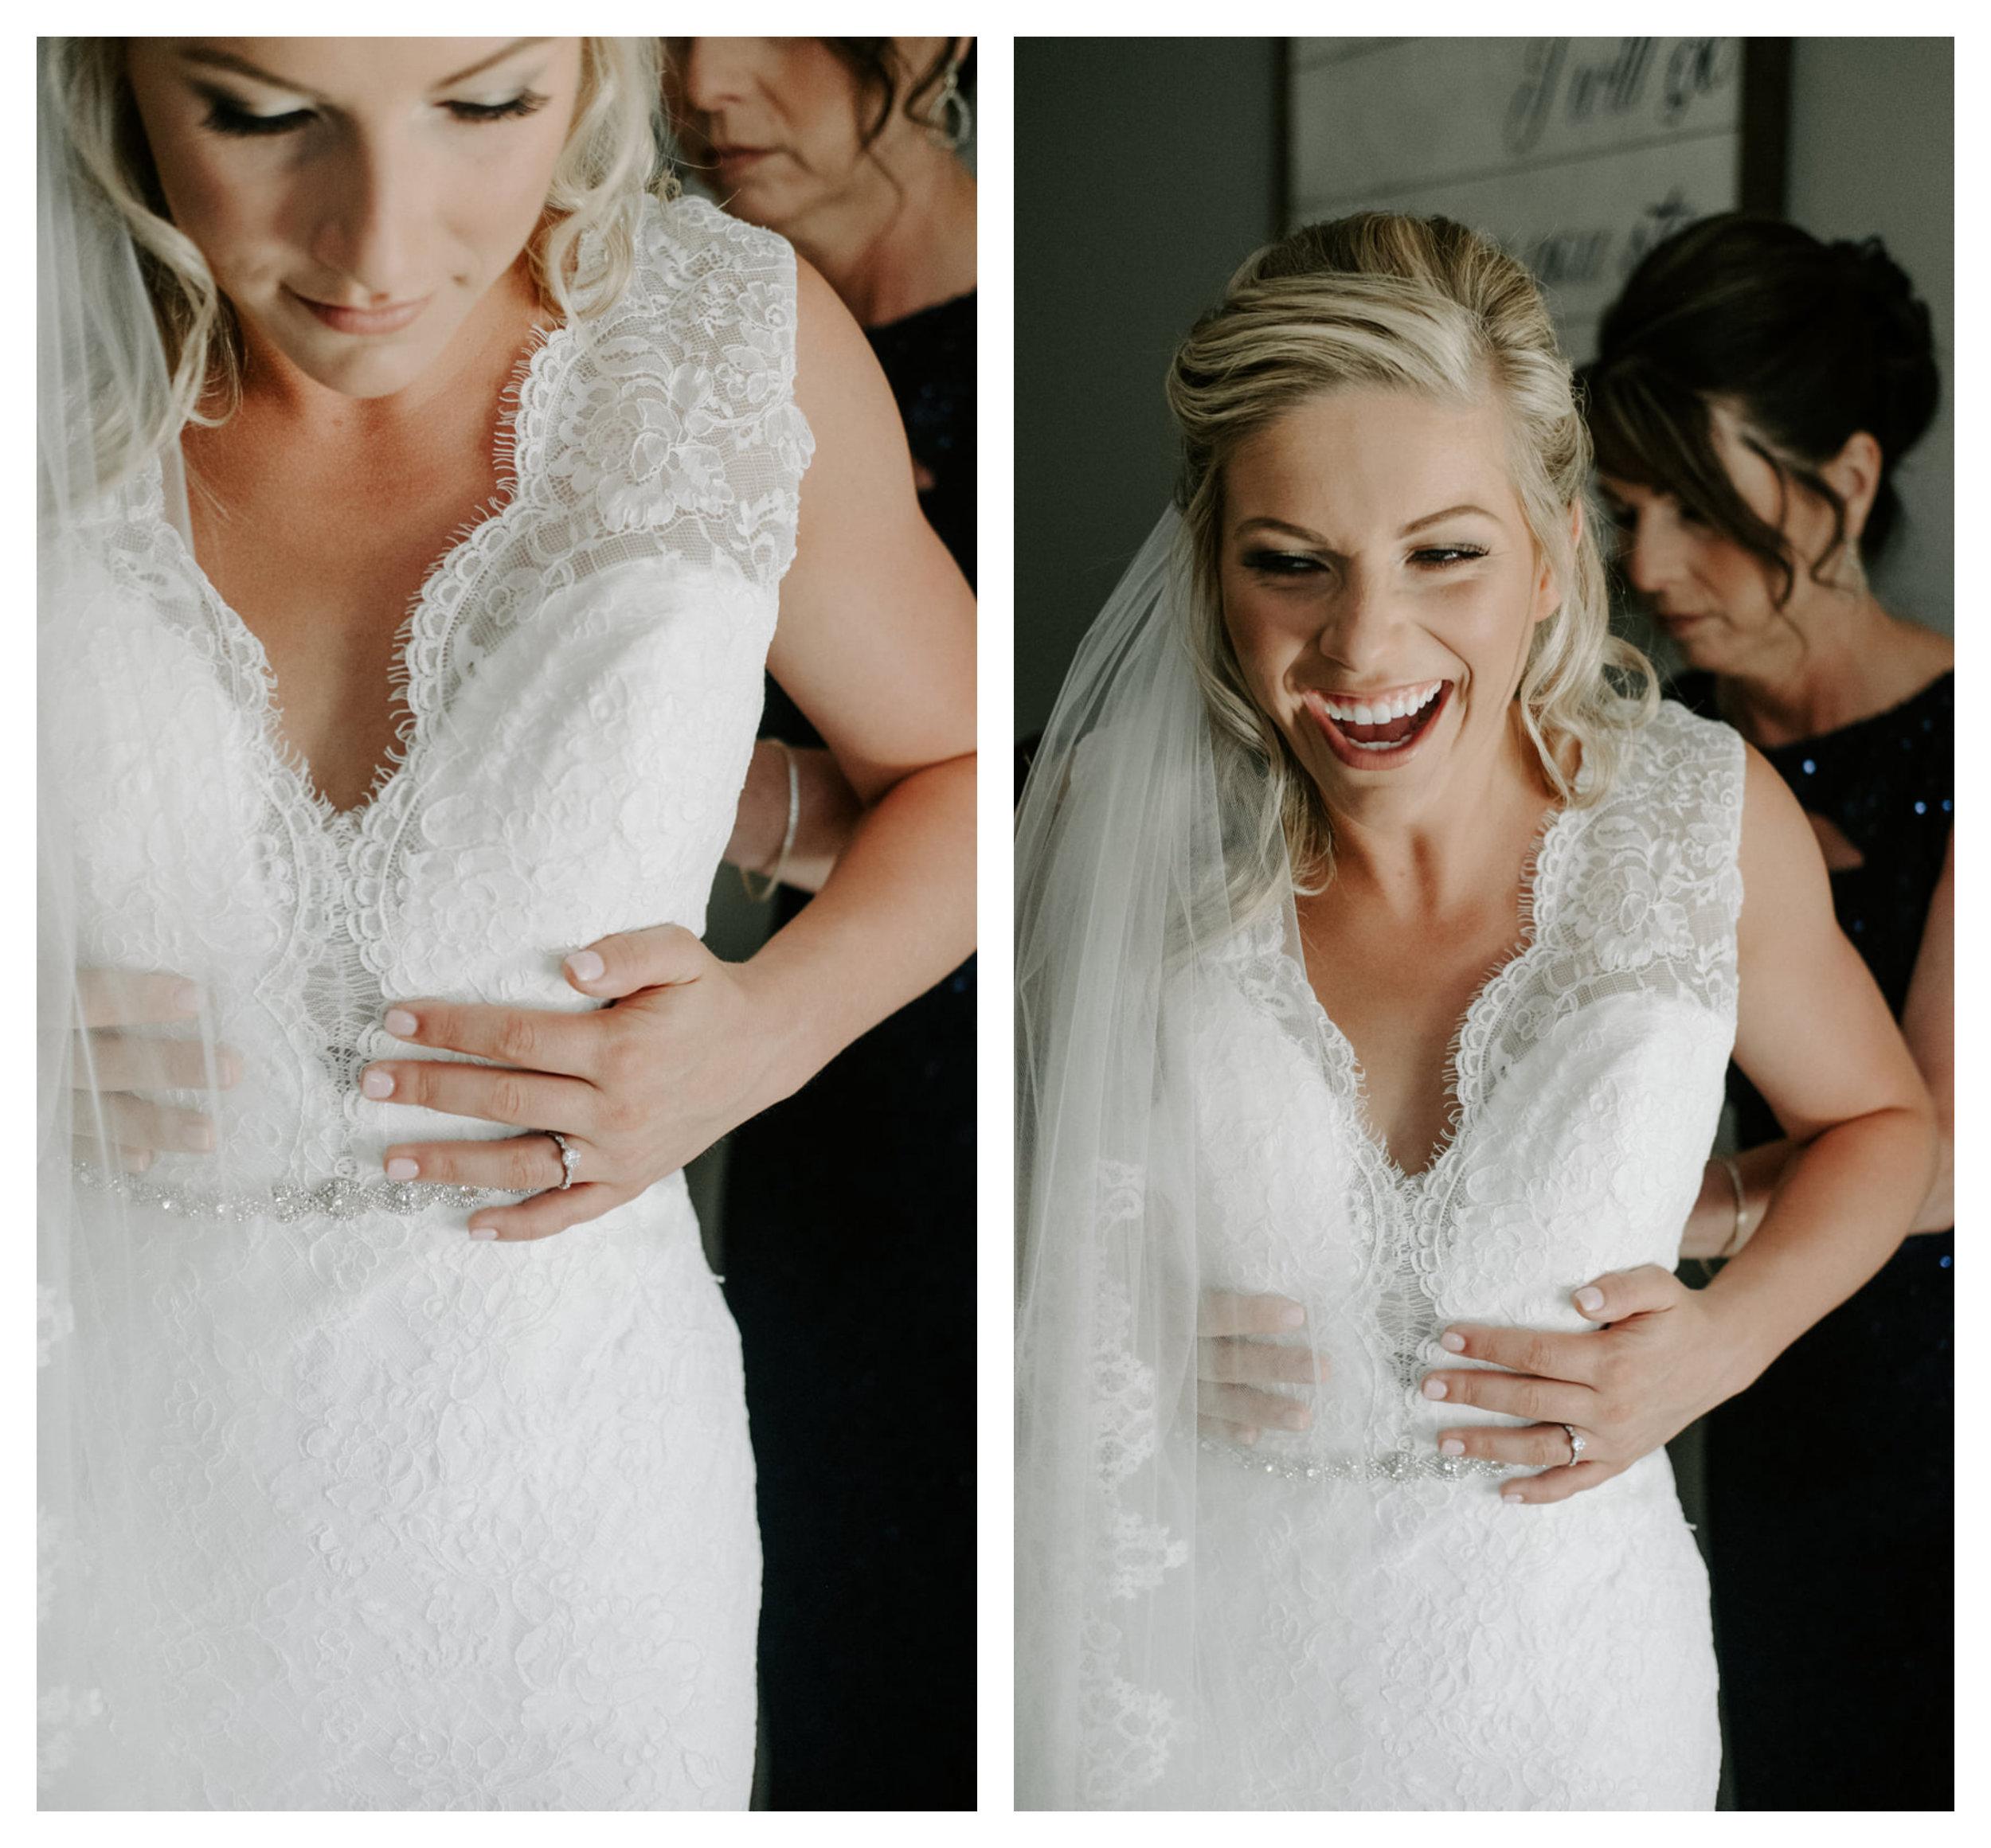 Webster Wedding Blog - Kansas City Bride4